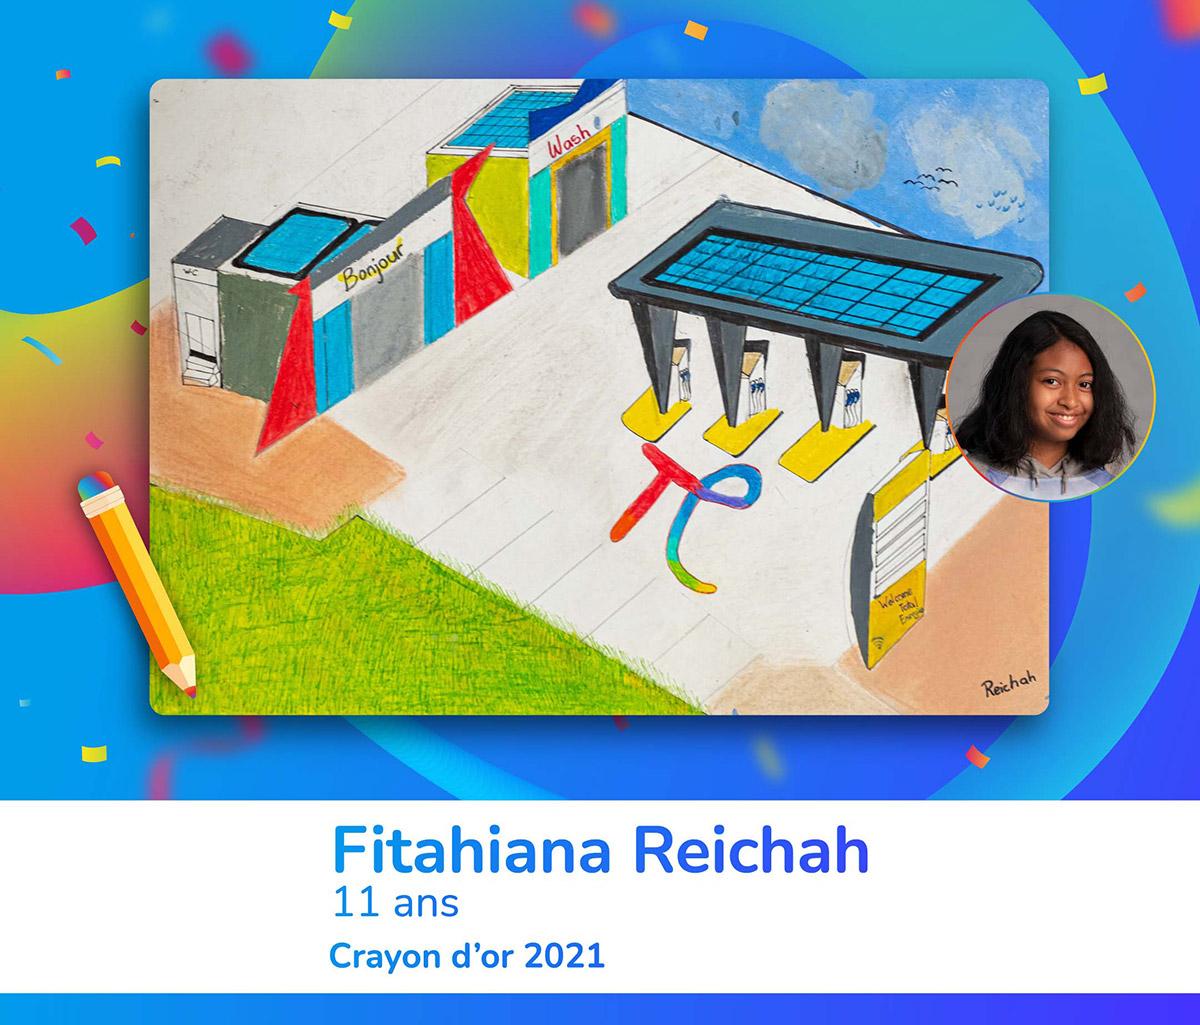 Fitahiana